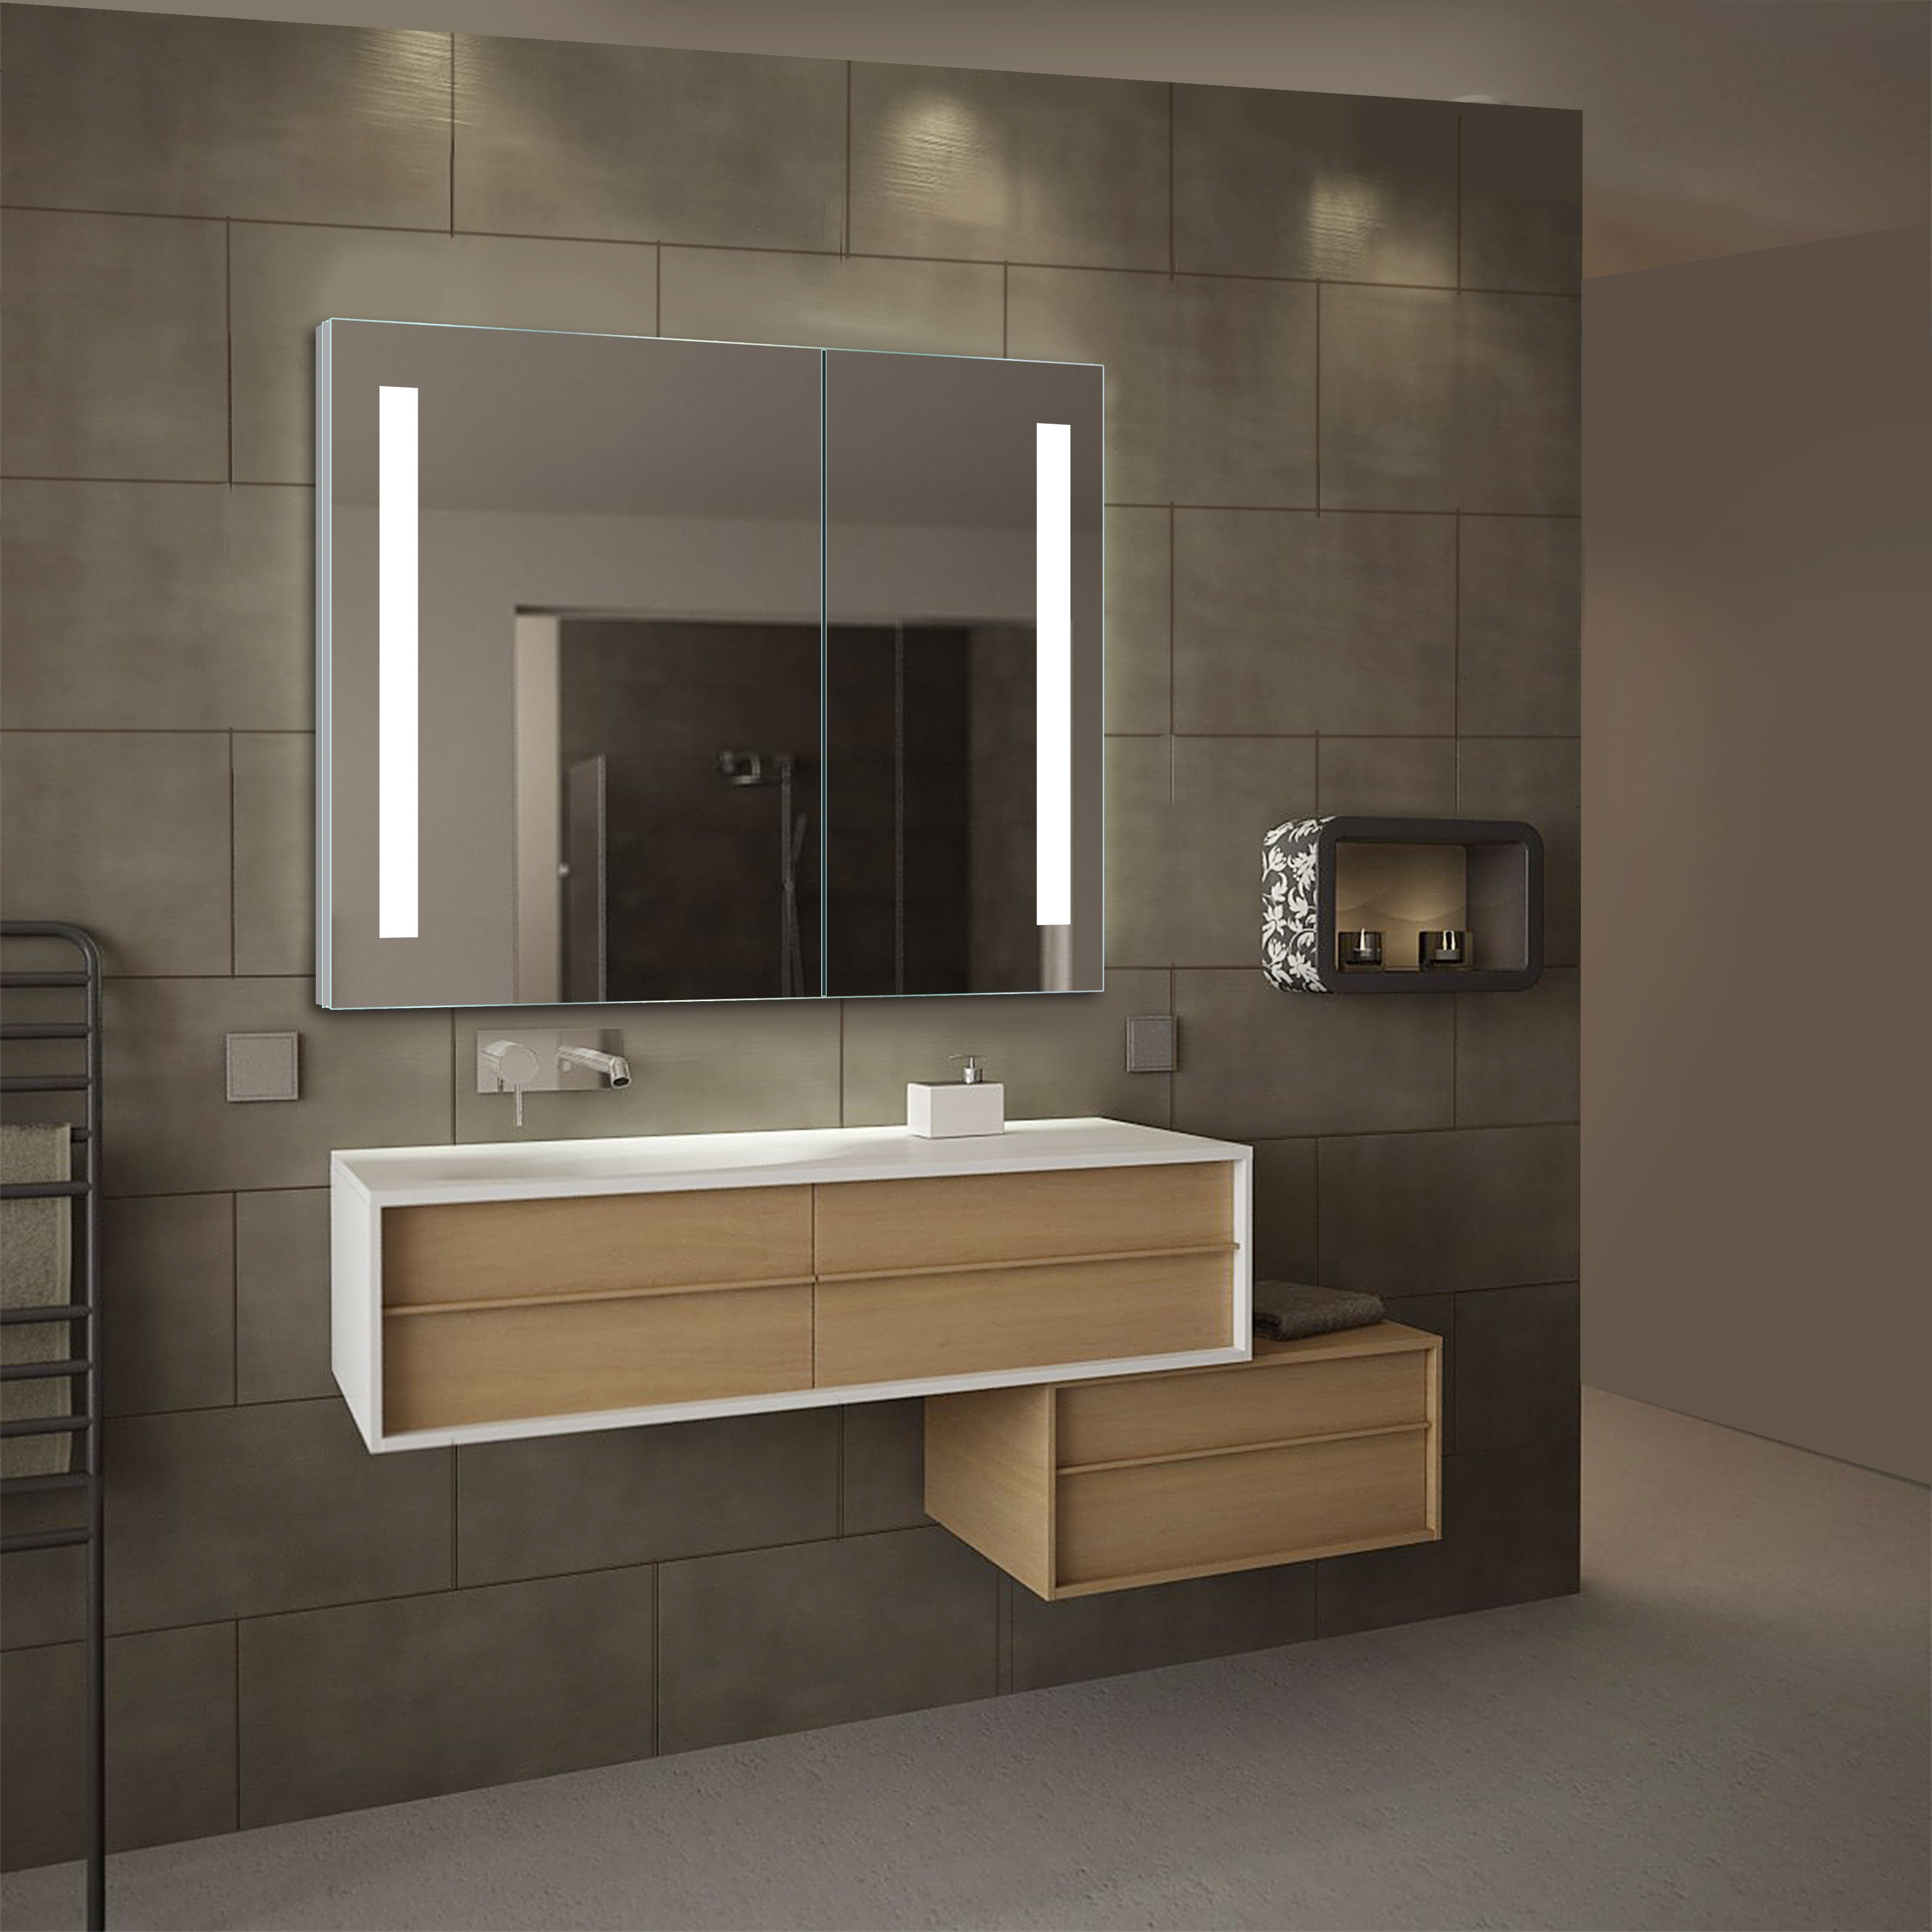 Home Mirror Cabinets Mirror Wall Bathroom Small Bathroom